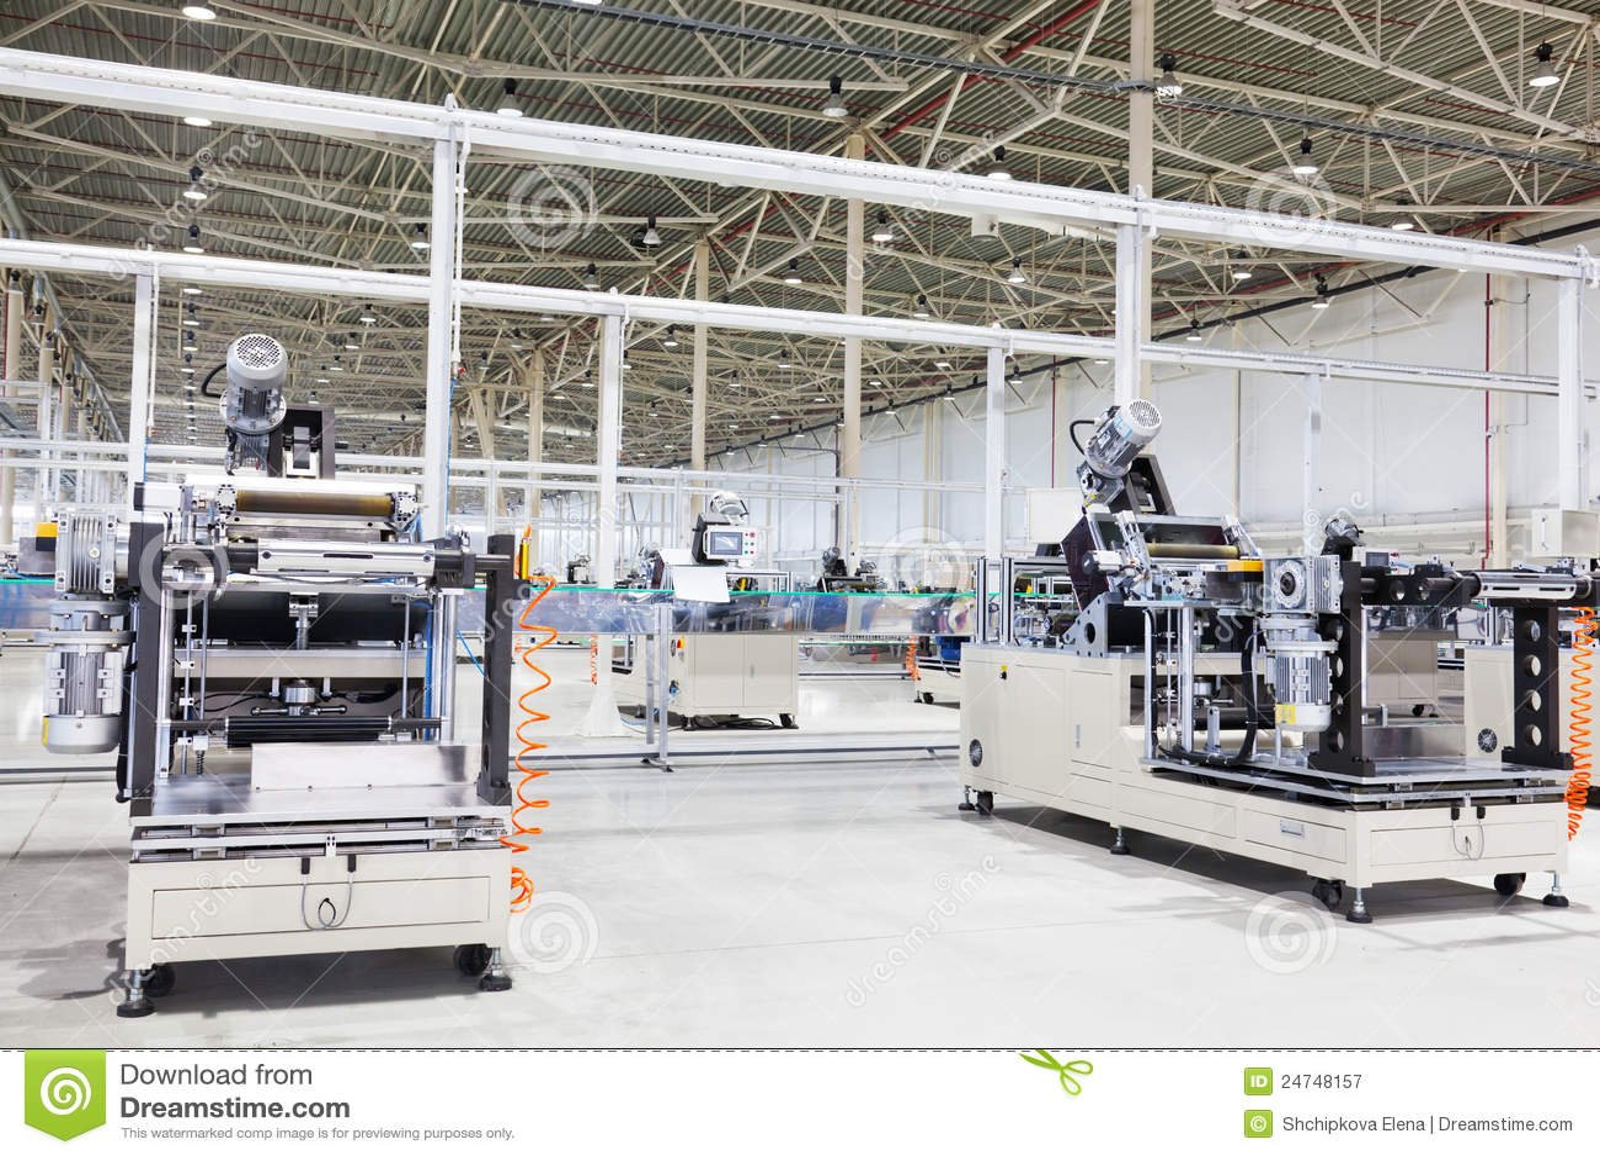 Modern Machines* Modern Machines, The·/ Measure [sa], The - The Modern Machines / The Measure [sa]